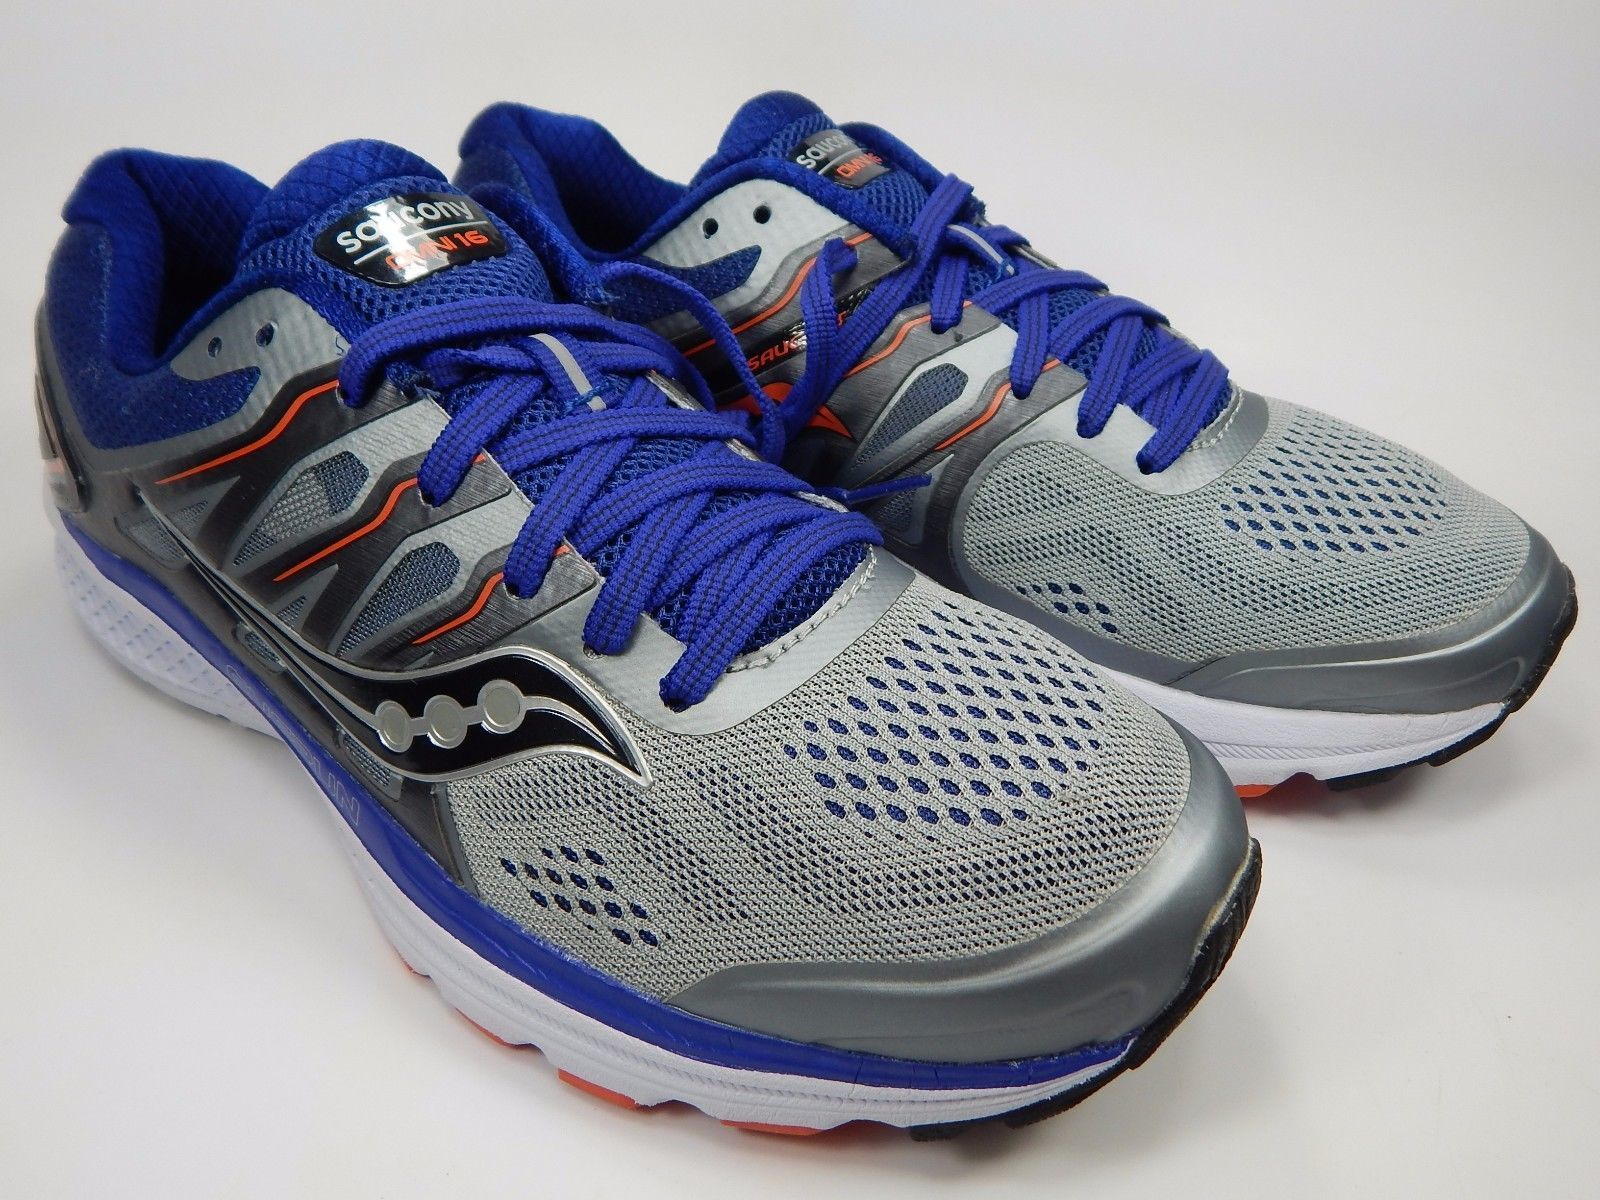 Saucony Omni 16 Men's Running Shoes Size US 9 M (D) EU 42.5 Gray S20370-1